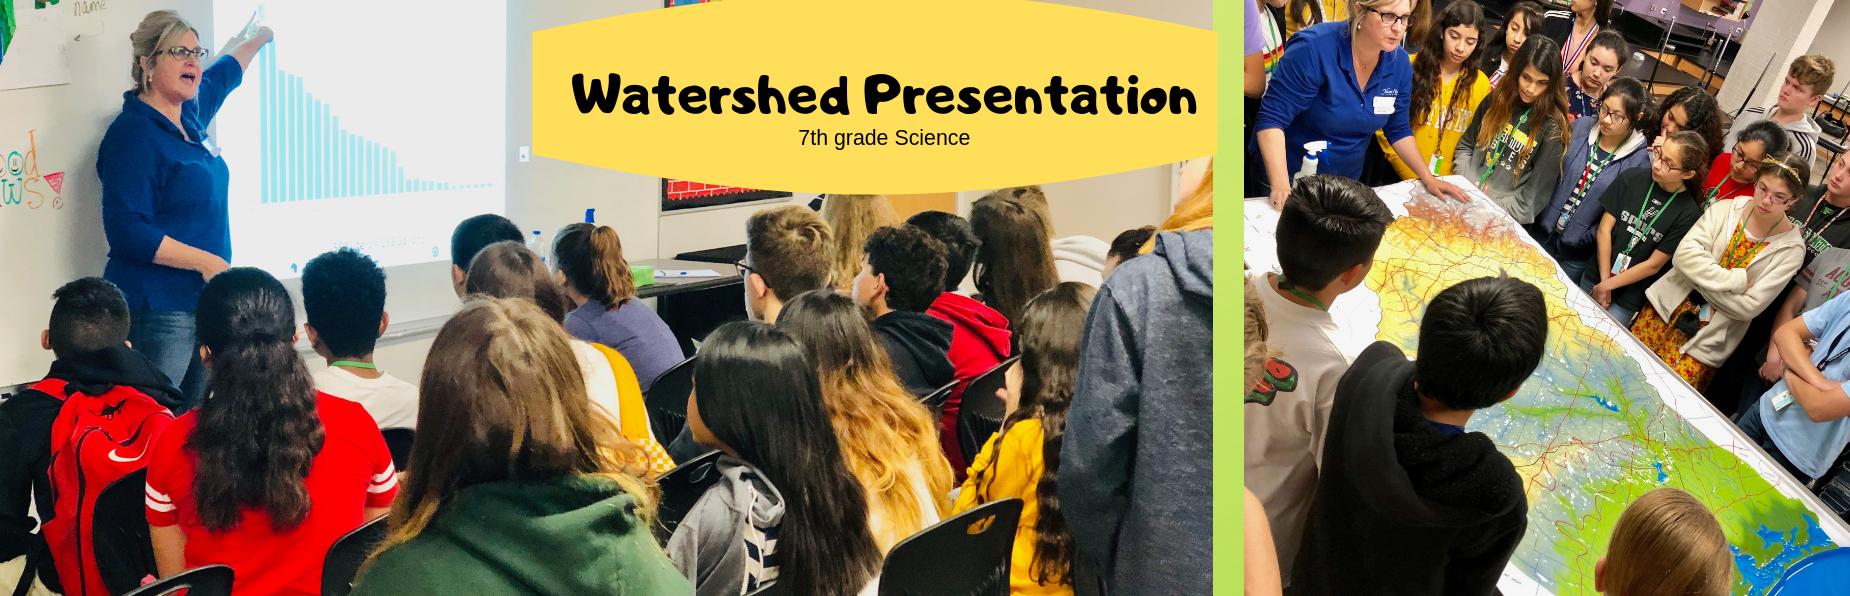 Watershed presentation